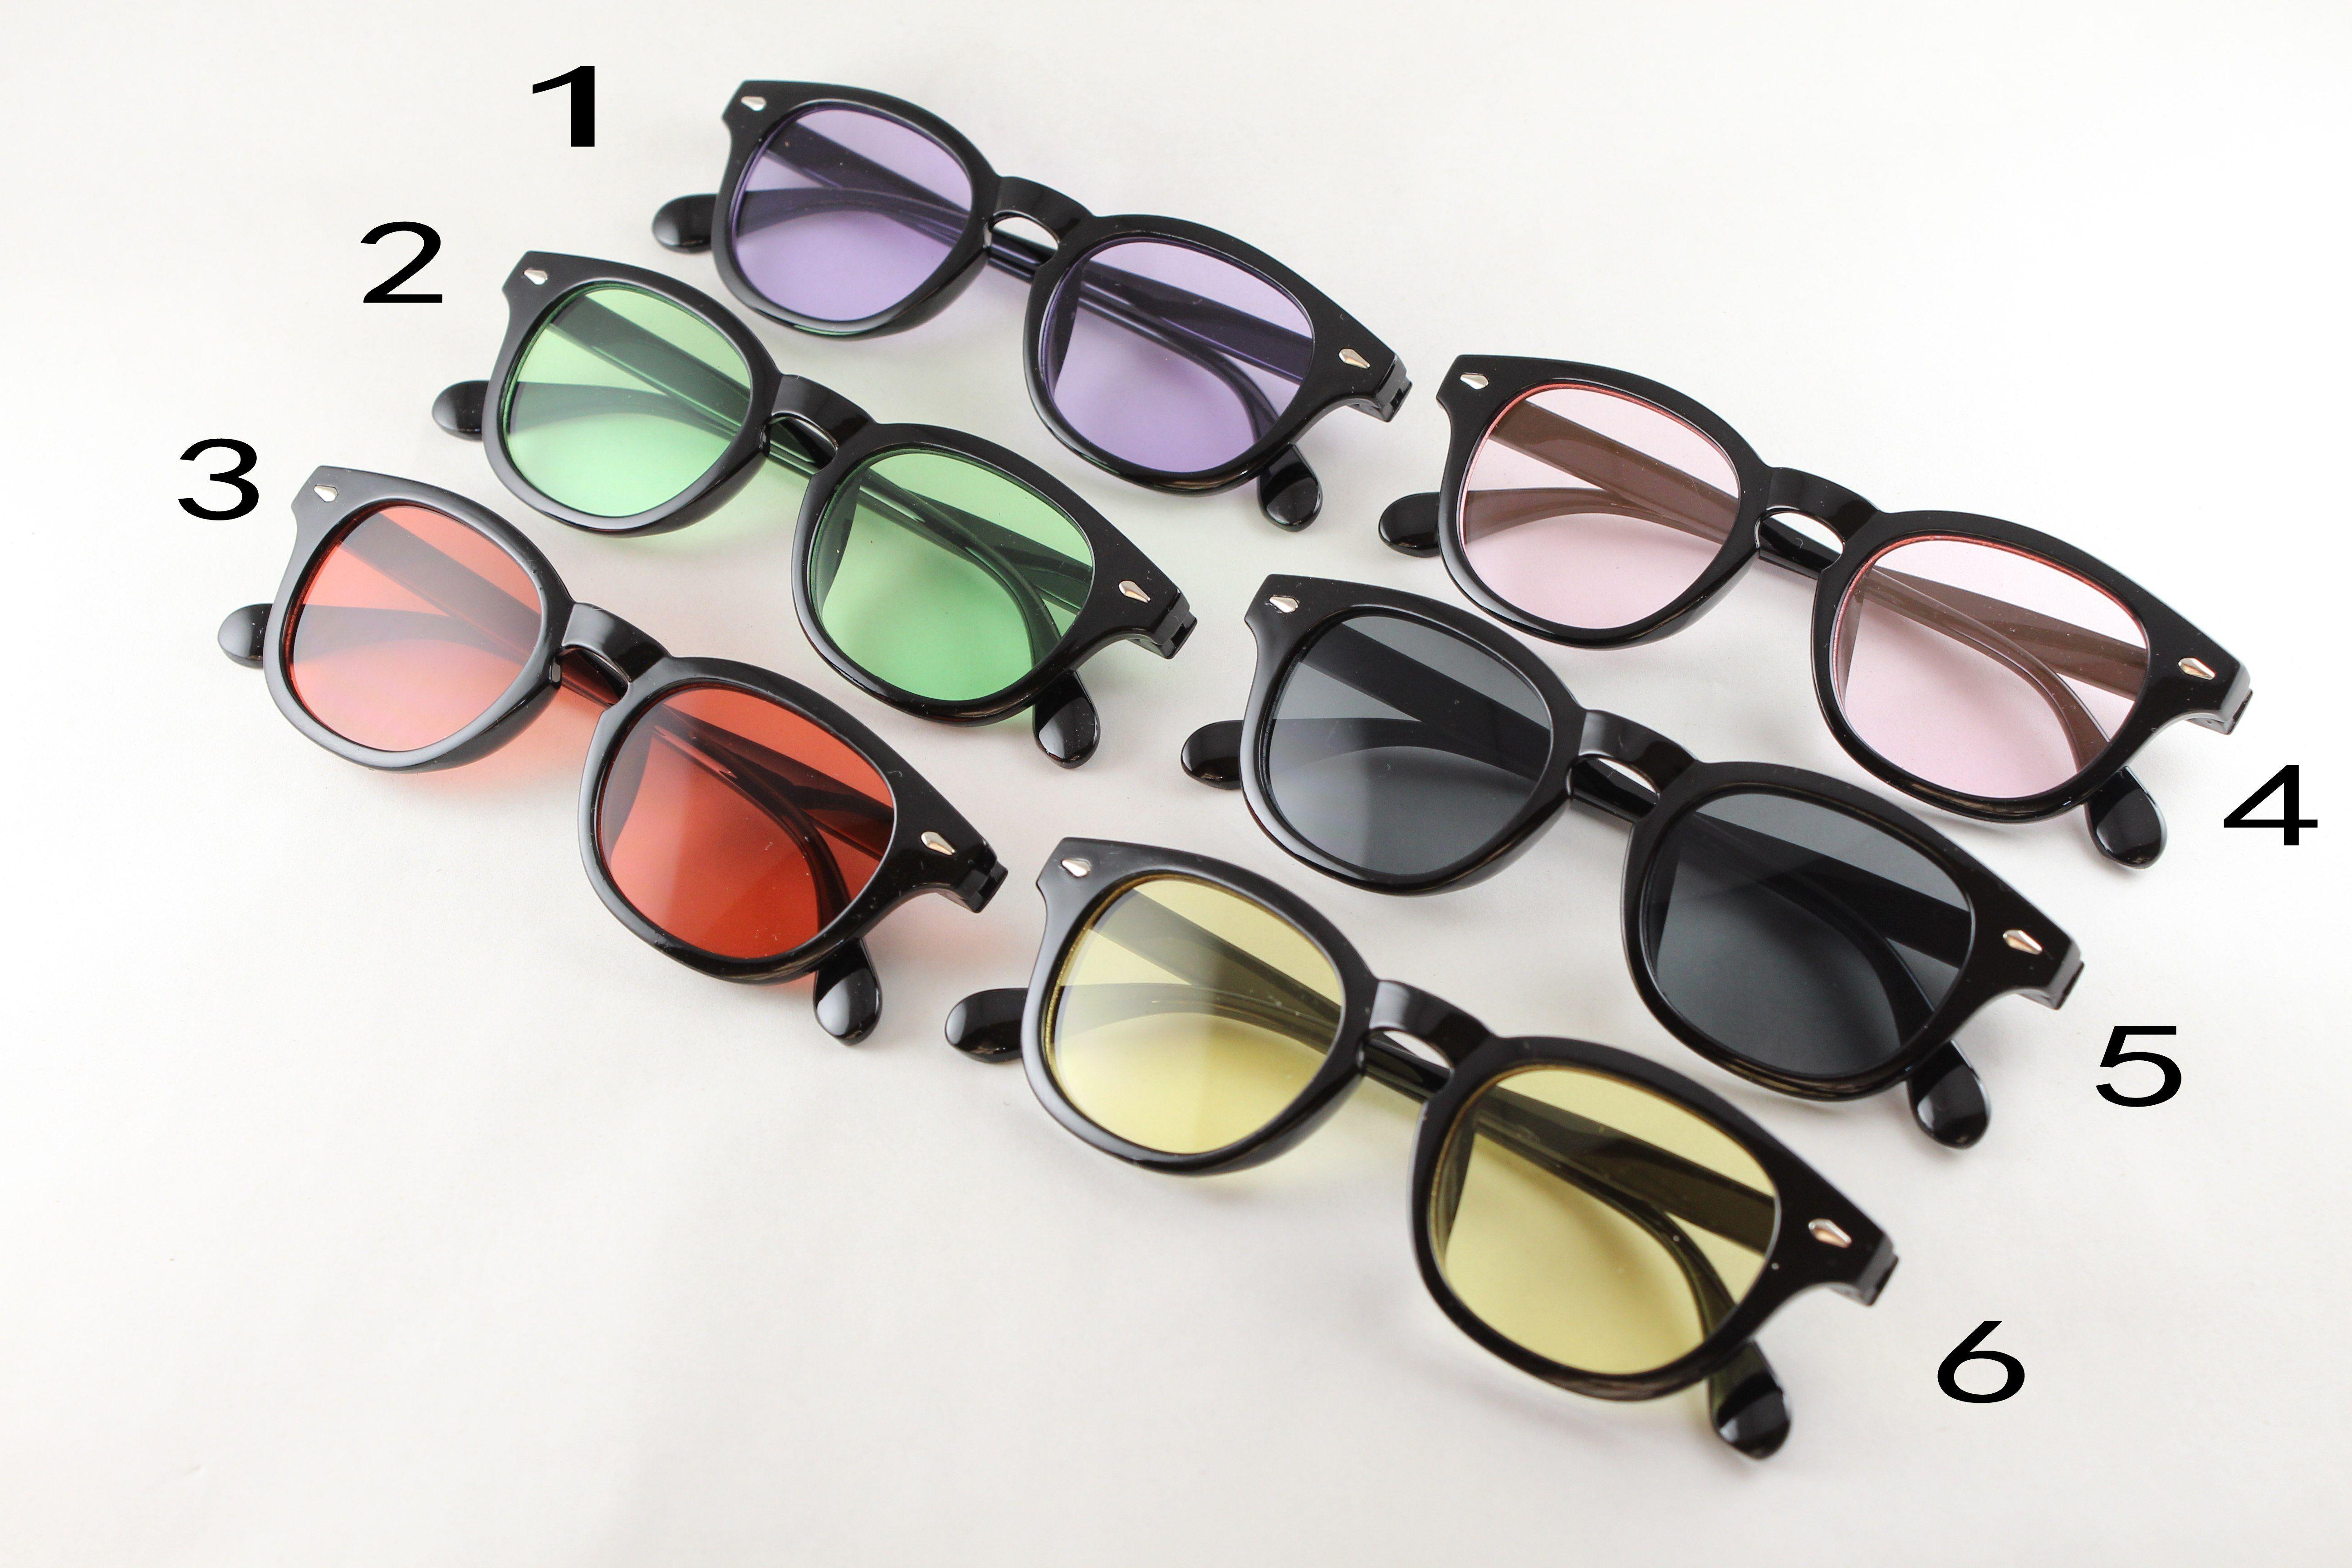 e68320afd1 2018 New Fashion Kids Sunglasses Girls Glasses Frame Children Sunglasses  Baby For Child Summer Pink Lens UV400 9005 Reading Glasses Prescription  Sunglasses ...